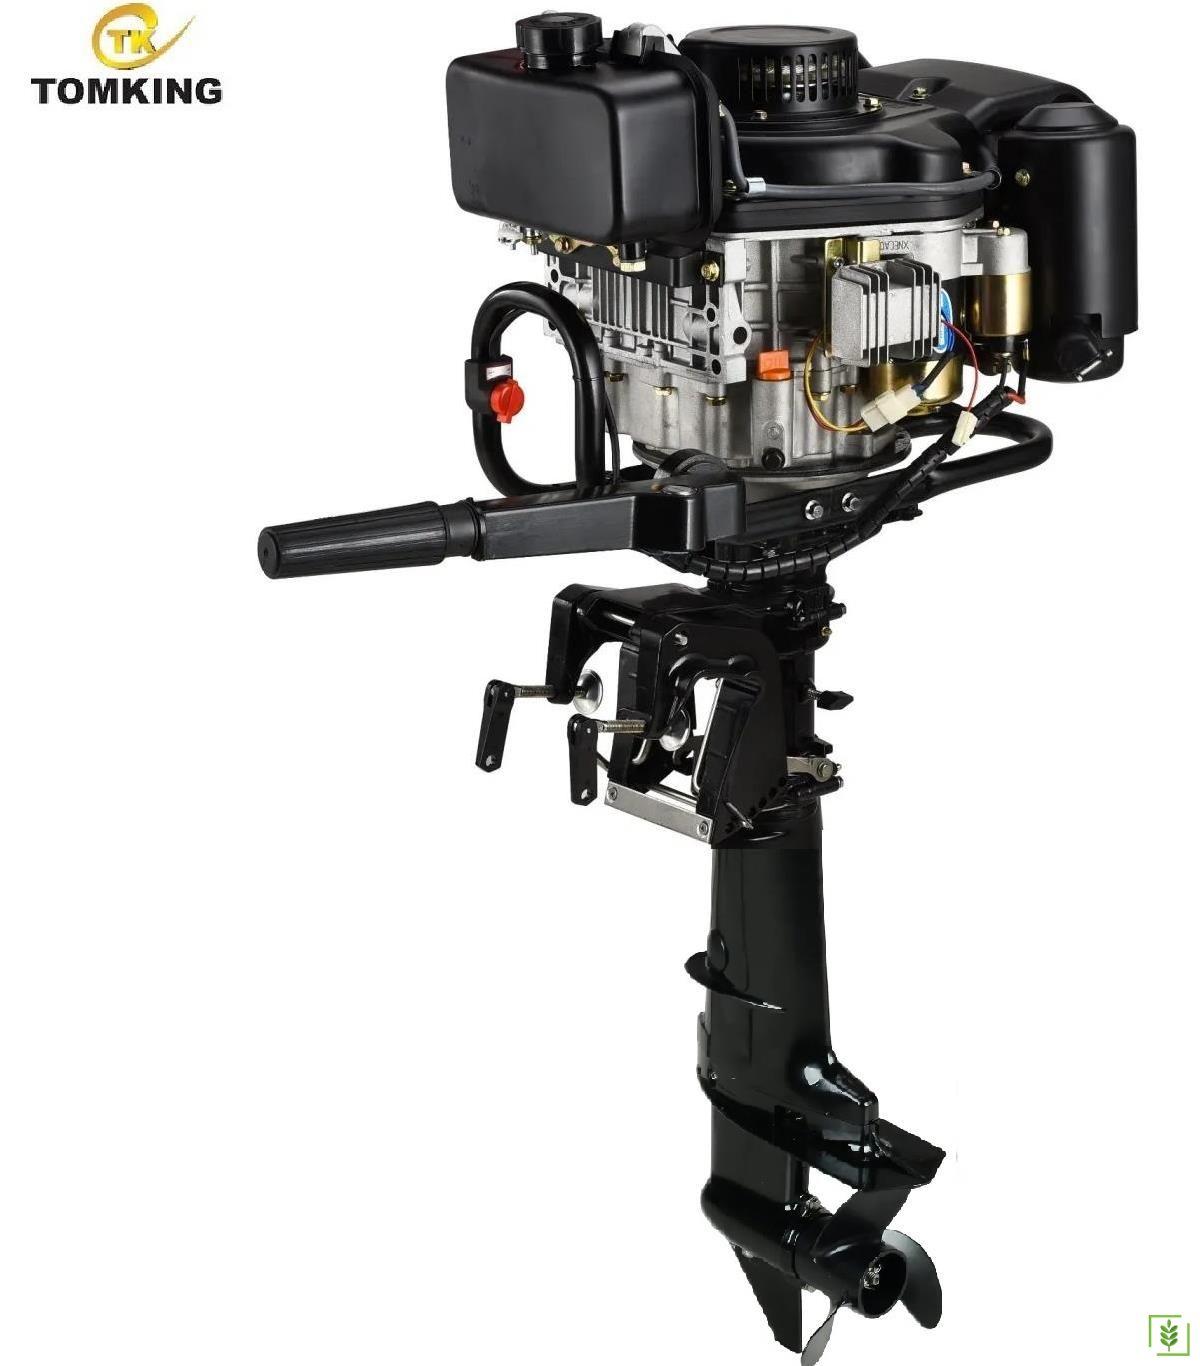 Tomking TKDS173F Dizel Marşlı Tekne-Bot Motoru 8 Hp